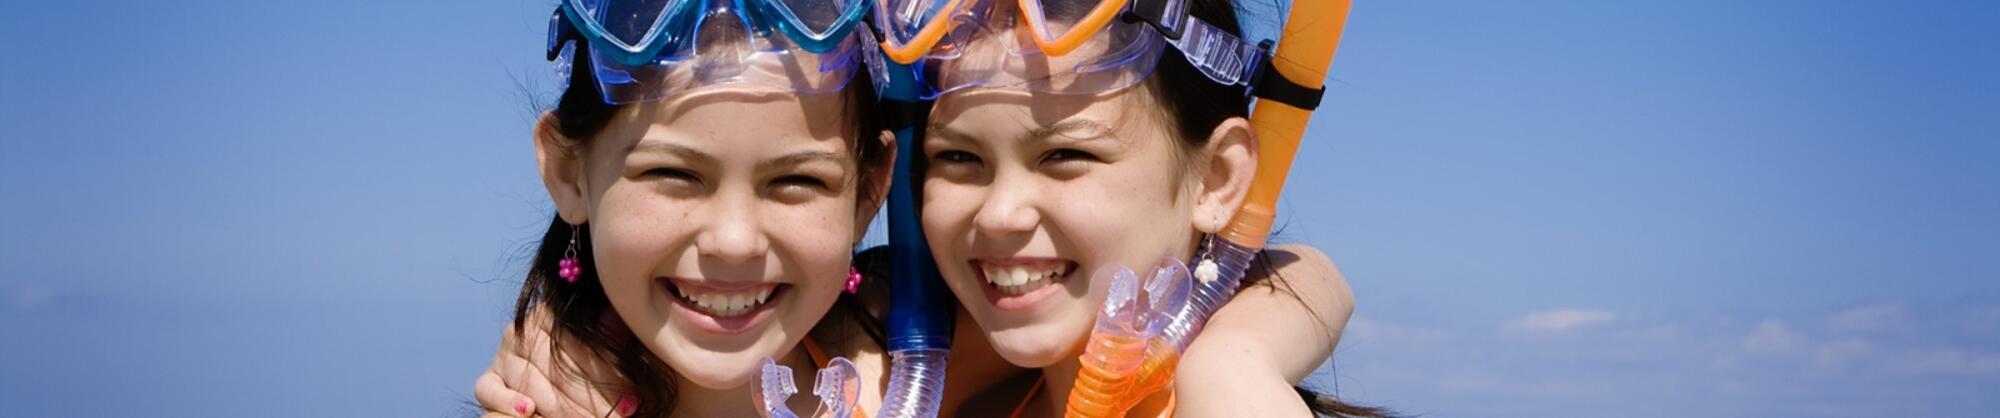 Offer 2nd week of July: FREE BEACH, CHILDREN -50%